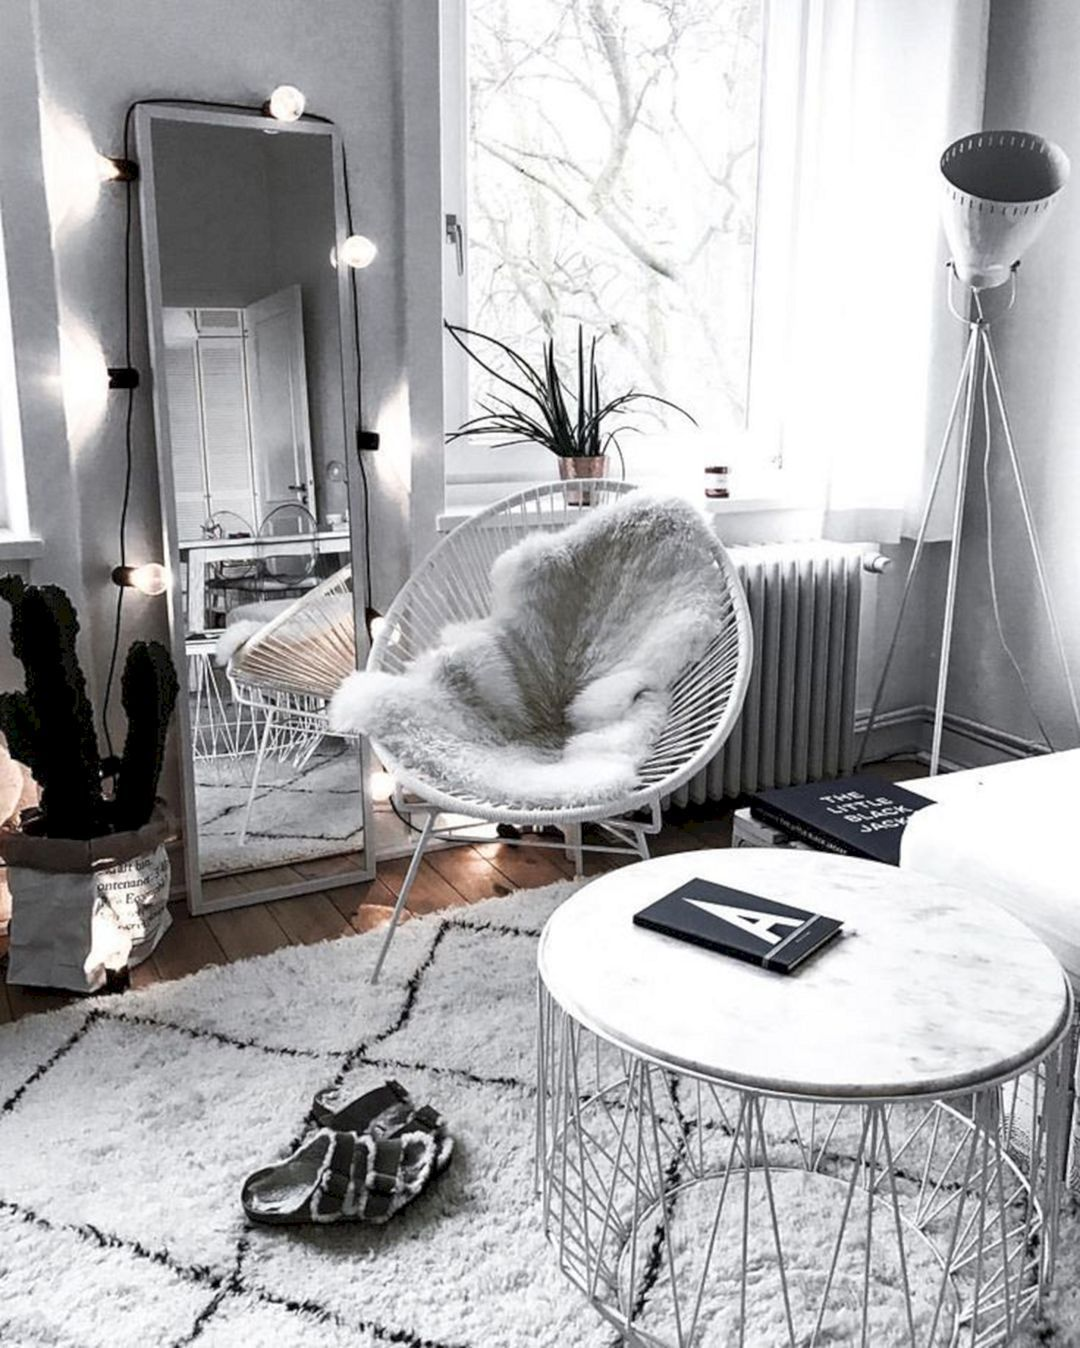 65+ Beautiful Aesthetic Room Decorations For Your Convenience / FresHOUZ.com -   - #aesthetic #beautiful #convenience #decorationappartement #decorations #diyDiningroomhutch #diyFamilyroom #diyhomecrafts #diyhomeideas #diyhomeonabudget #diyWoodencratesbookshelf #freshouz #FresHOUZcom #Livingroomdecor #Room #roomdecoration #Rustichouse